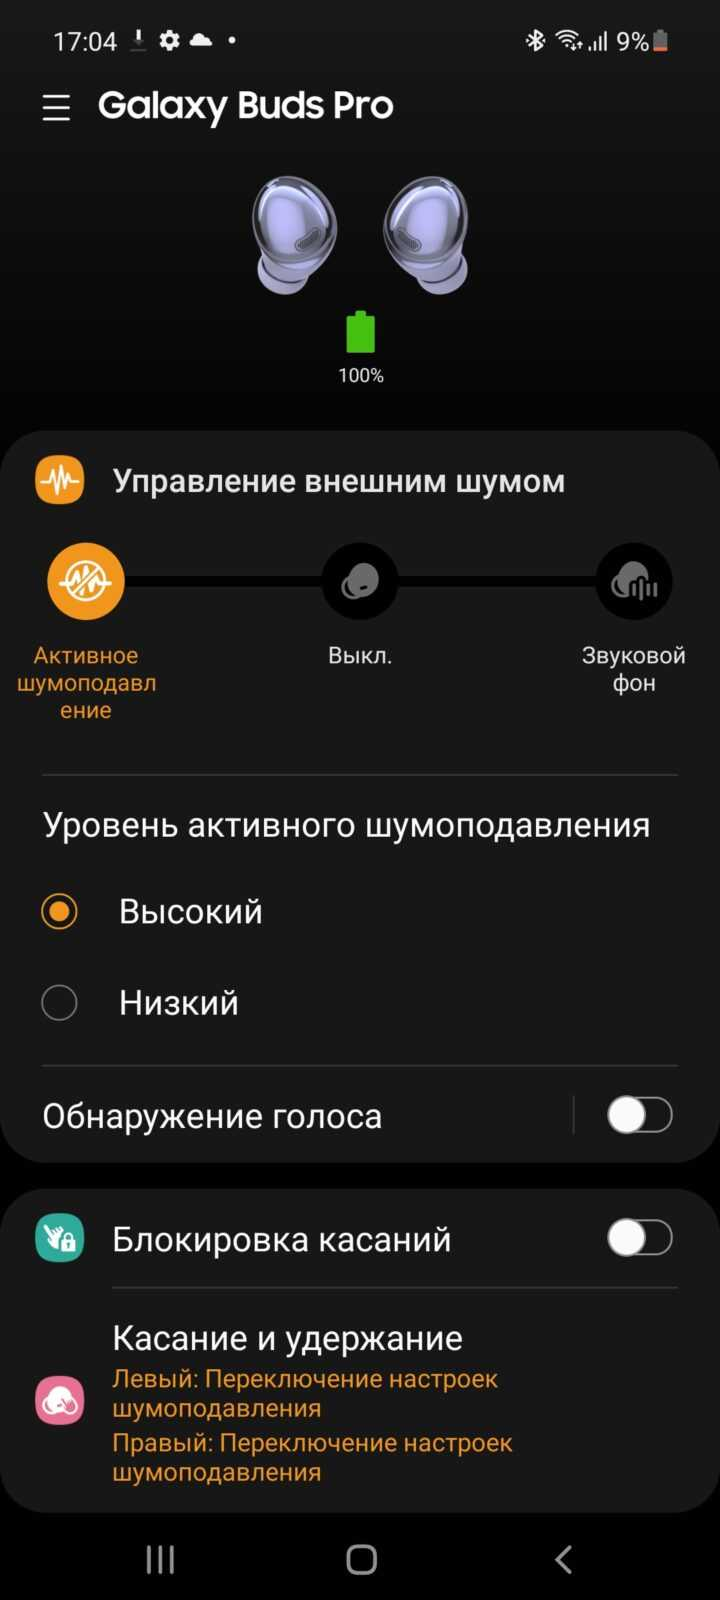 Обзор наушников Samsung Galaxy Buds Pro: звук со стилем (screenshot 20210502 170413 galaxy buds pro)